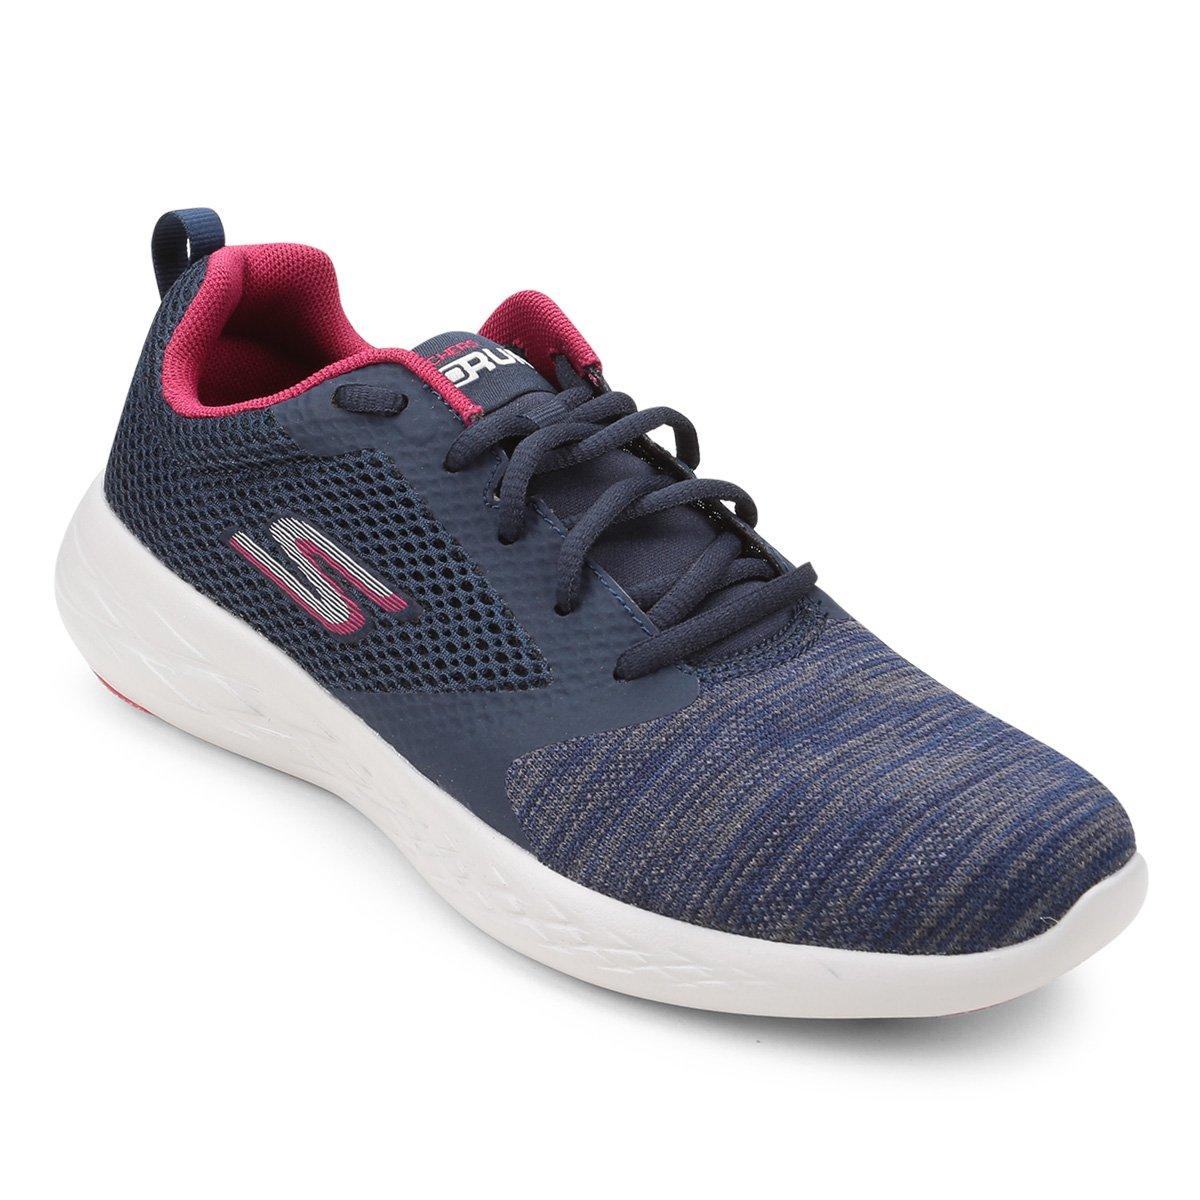 a5cc406488c54 FornecedorNetshoes. Tênis Skechers Go Run 600 Reactor Feminino